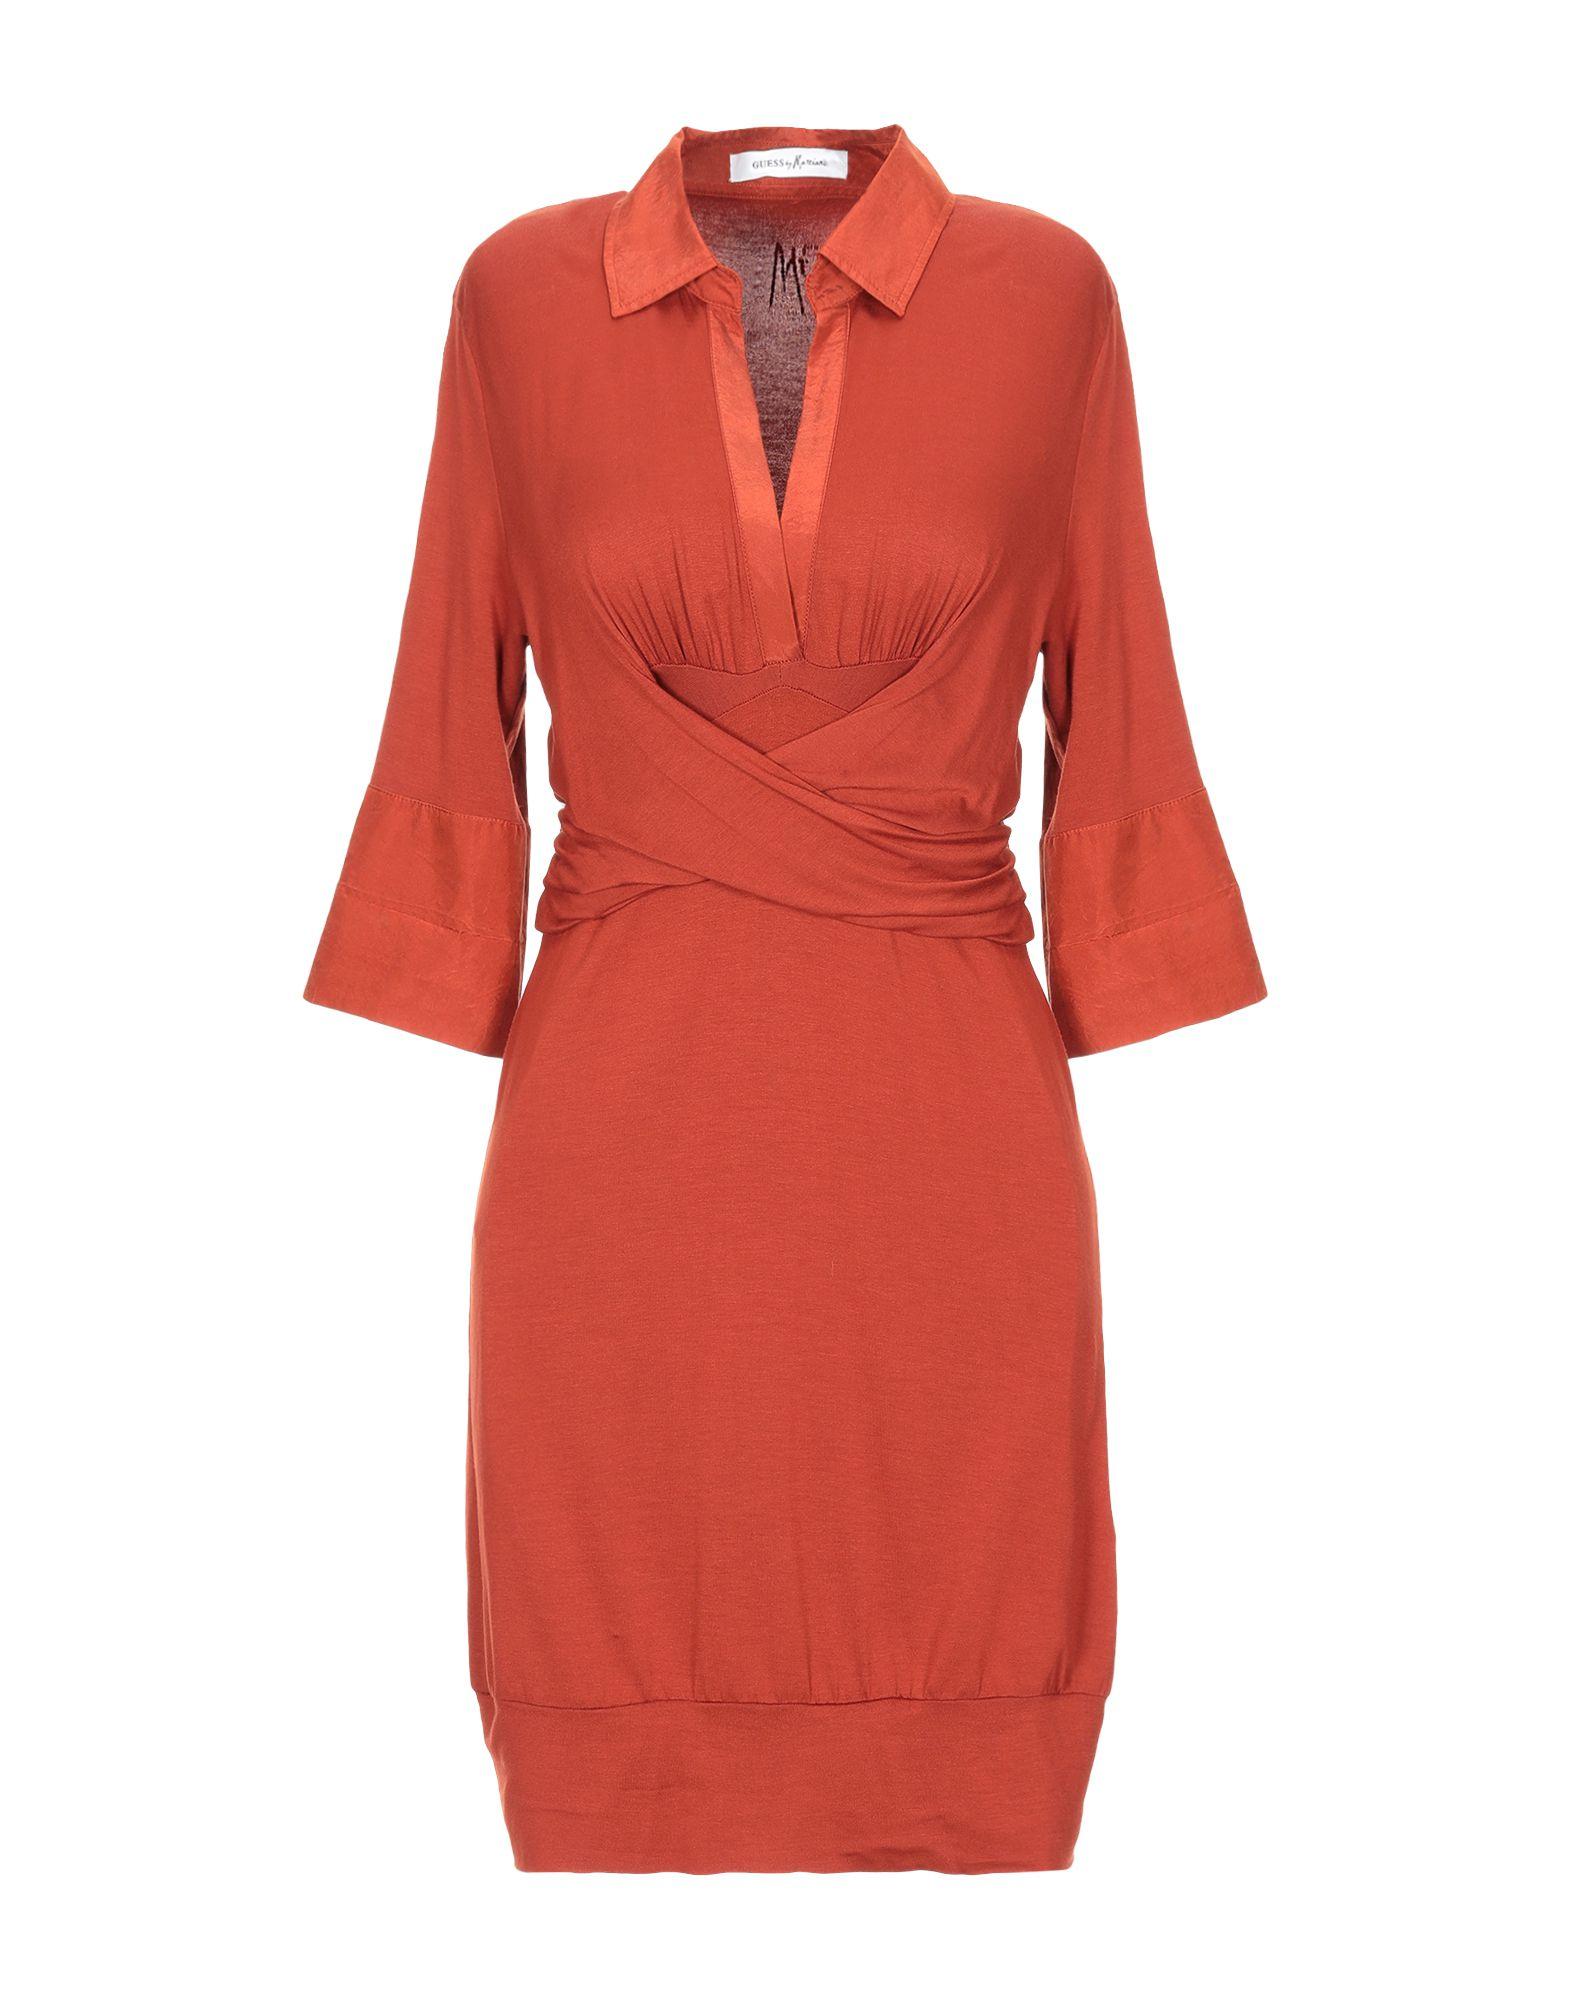 GUESS BY MARCIANO Короткое платье джемпер marciano guess 74g543 5356z g835